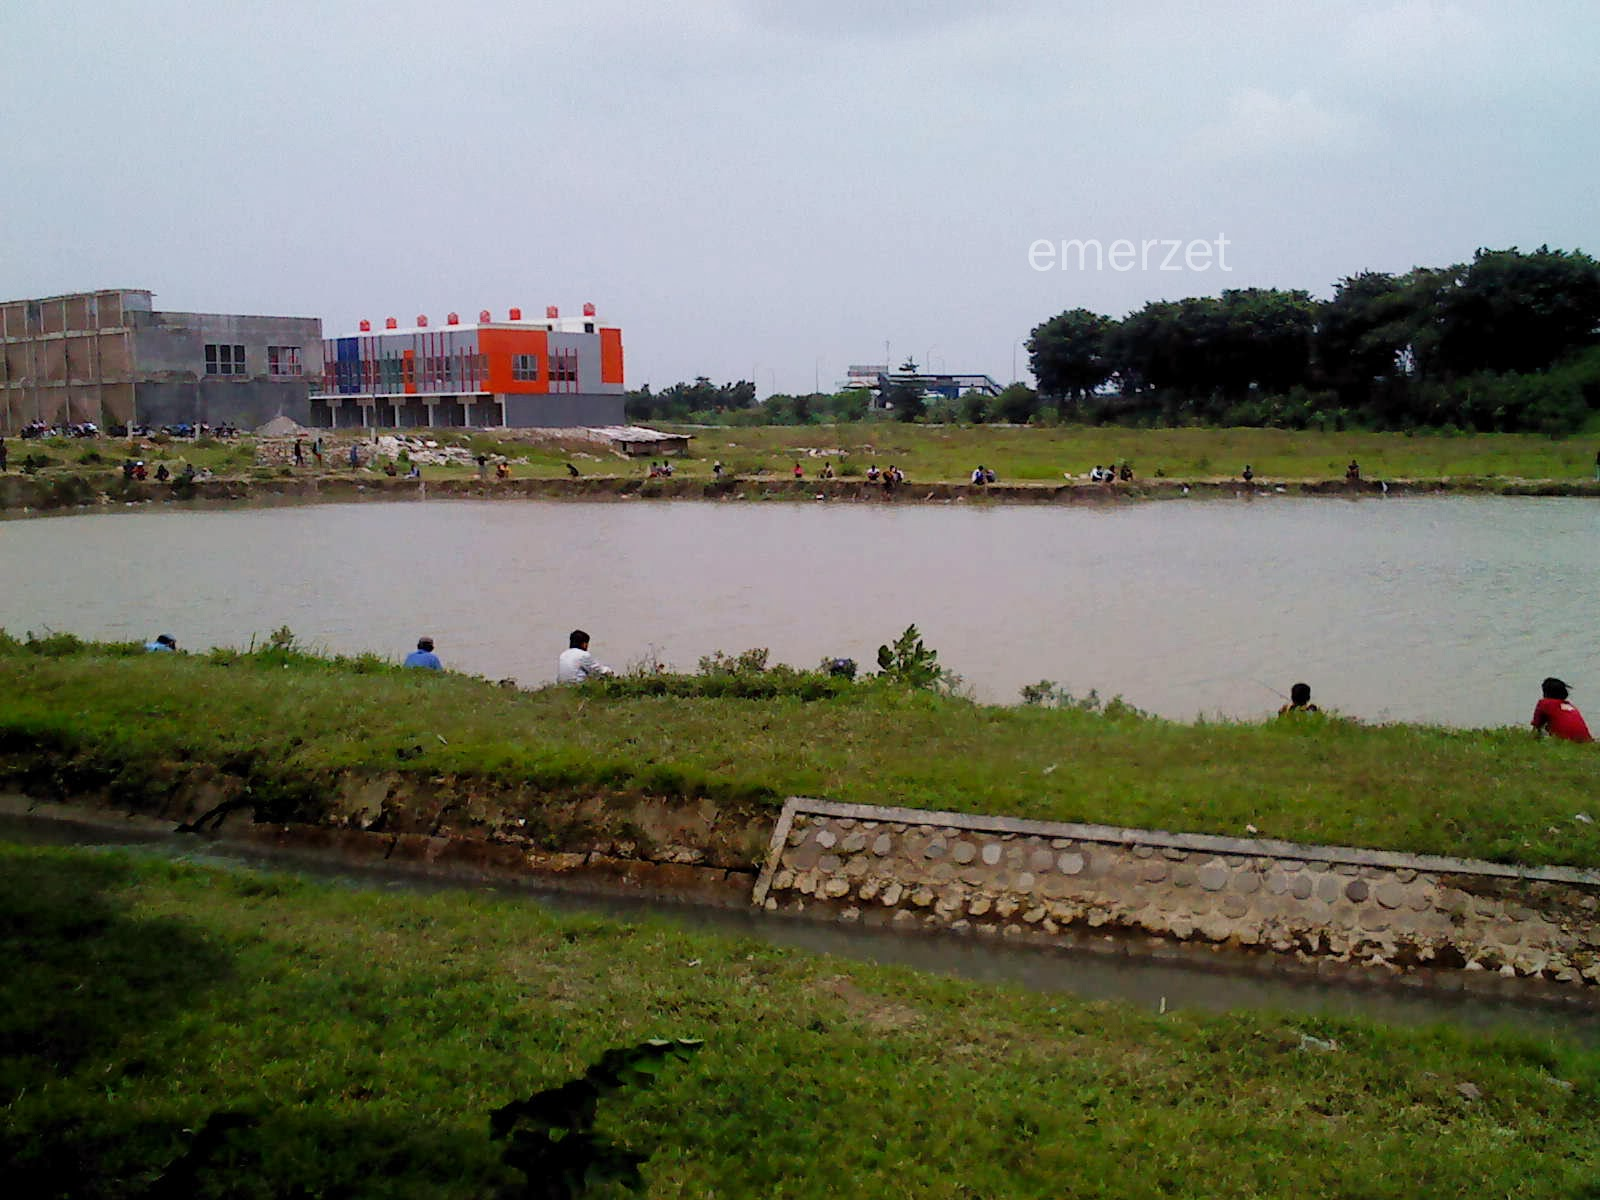 Pembangunan Plumbon Square-Kabupaten Cirebon, 15 Februari 2014 Kemungkinan lokasi yang terlihat dijadikan tempat pemancingan adalah tempat Mall+Hotel berada